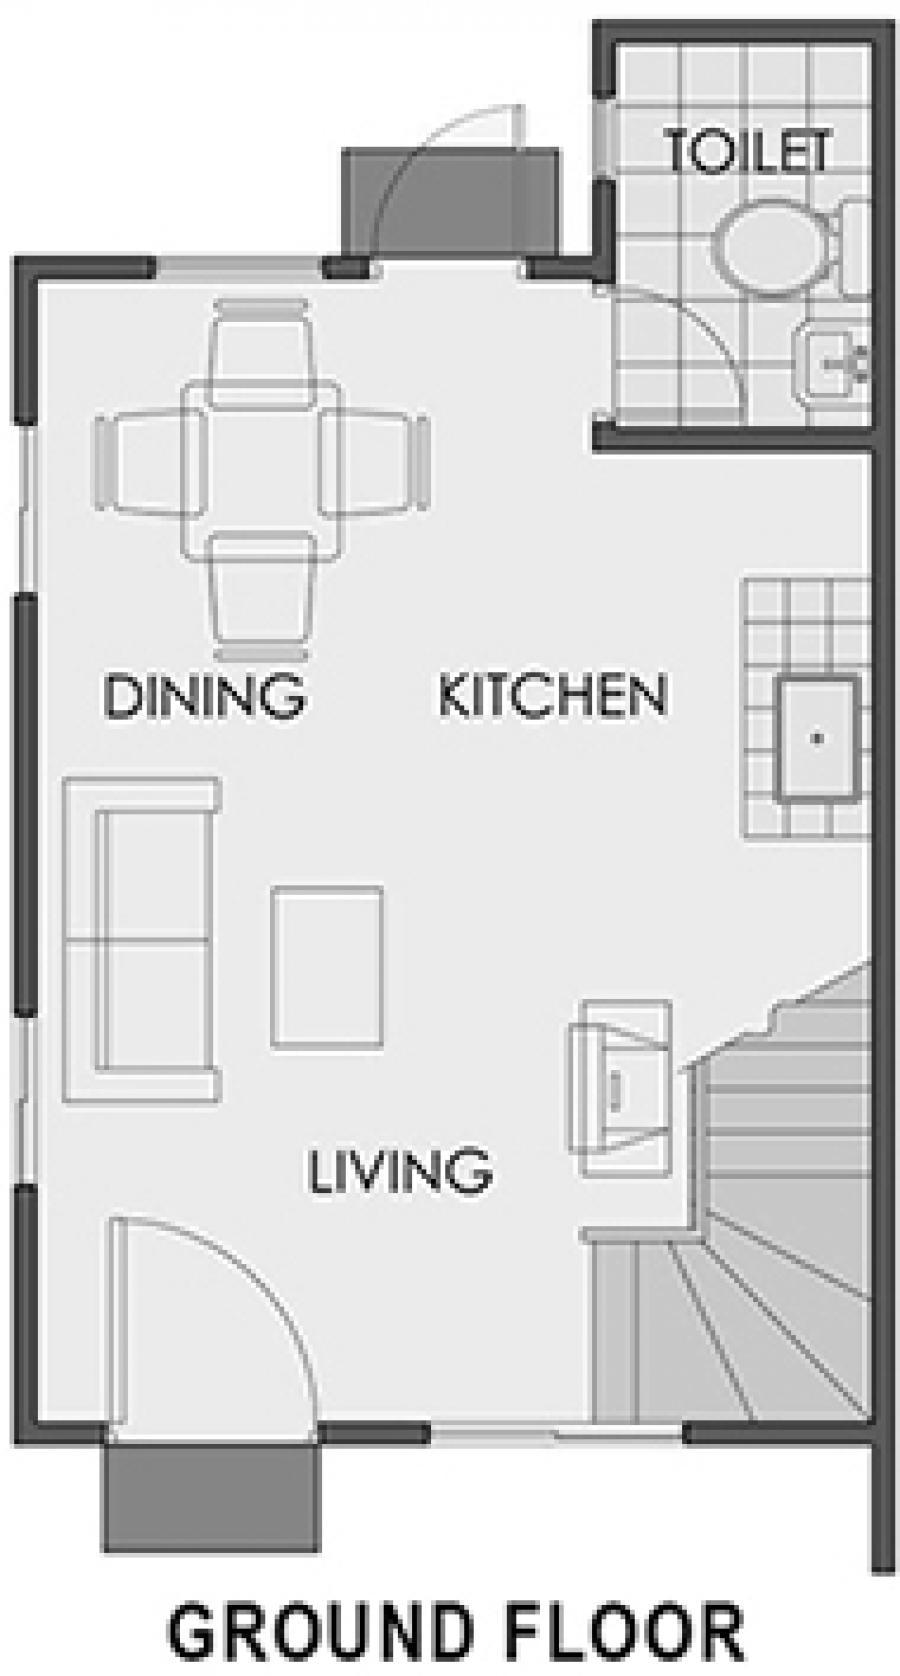 Agusan del Sur - Mikaela-TH Ground Floor Plan